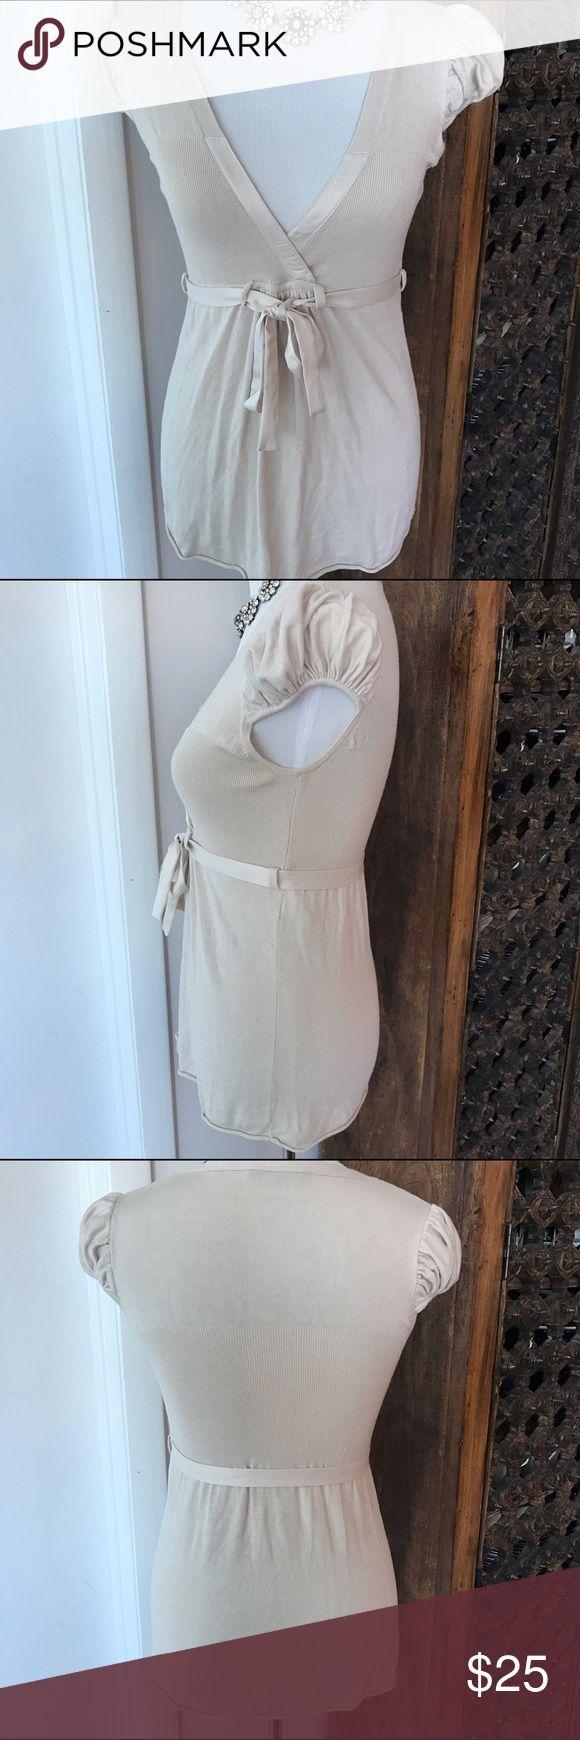 Kookai Knit Cream cap sleeve Top Kookai cream cap sleeve top. Empire waist with tie belt. European Size 1 = S Kookai Tops